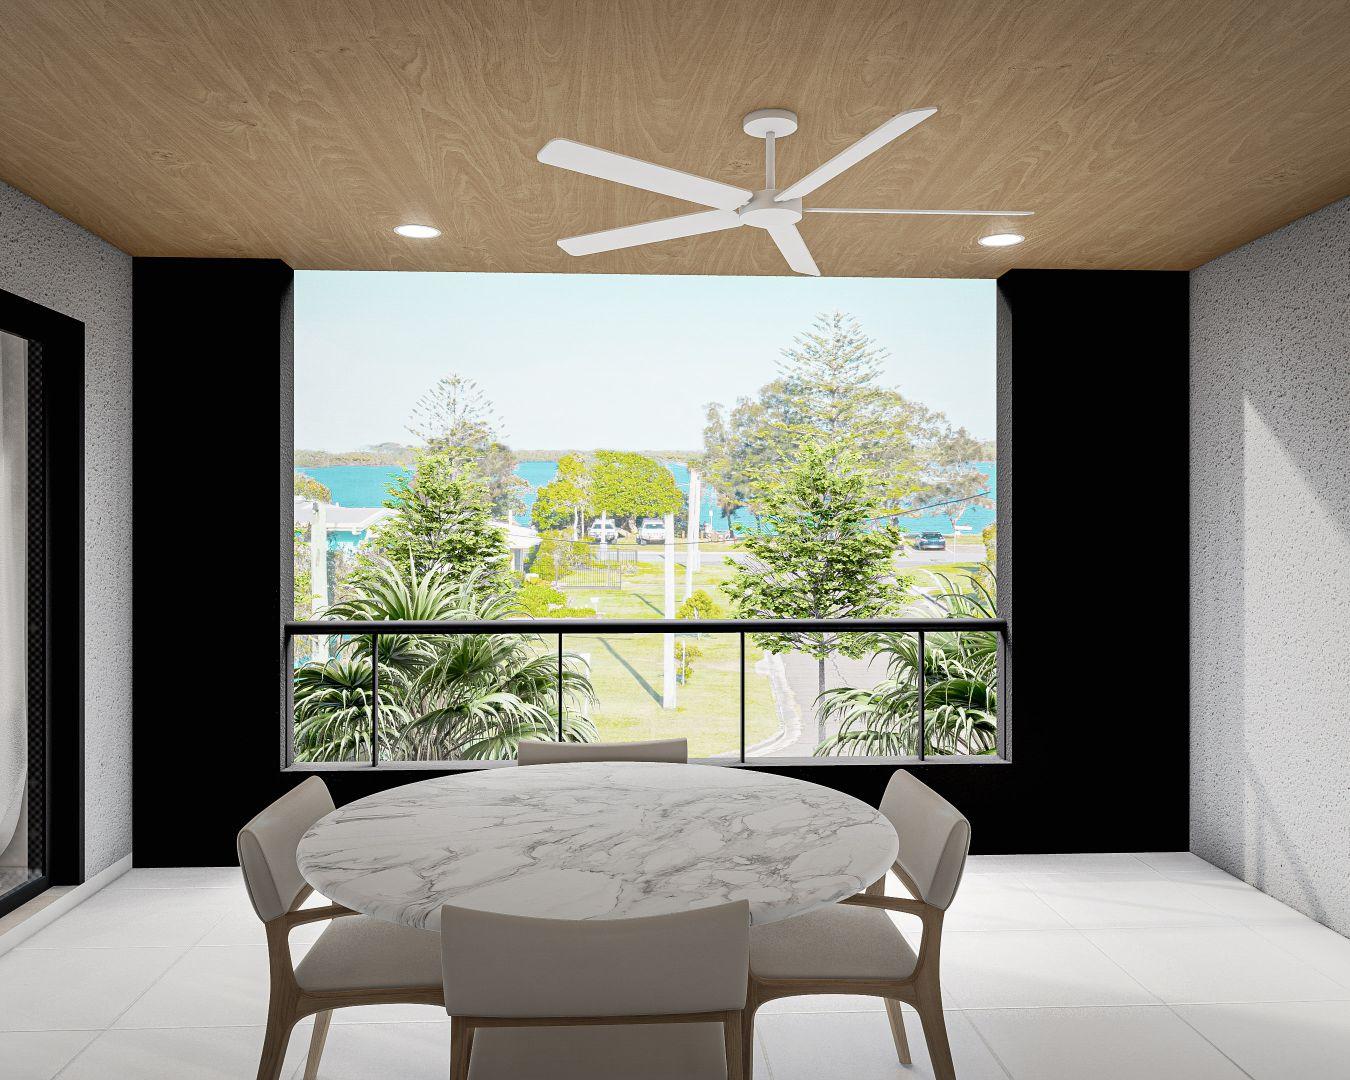 204/12 Anning Avenue, Golden Beach QLD 4551, Image 0